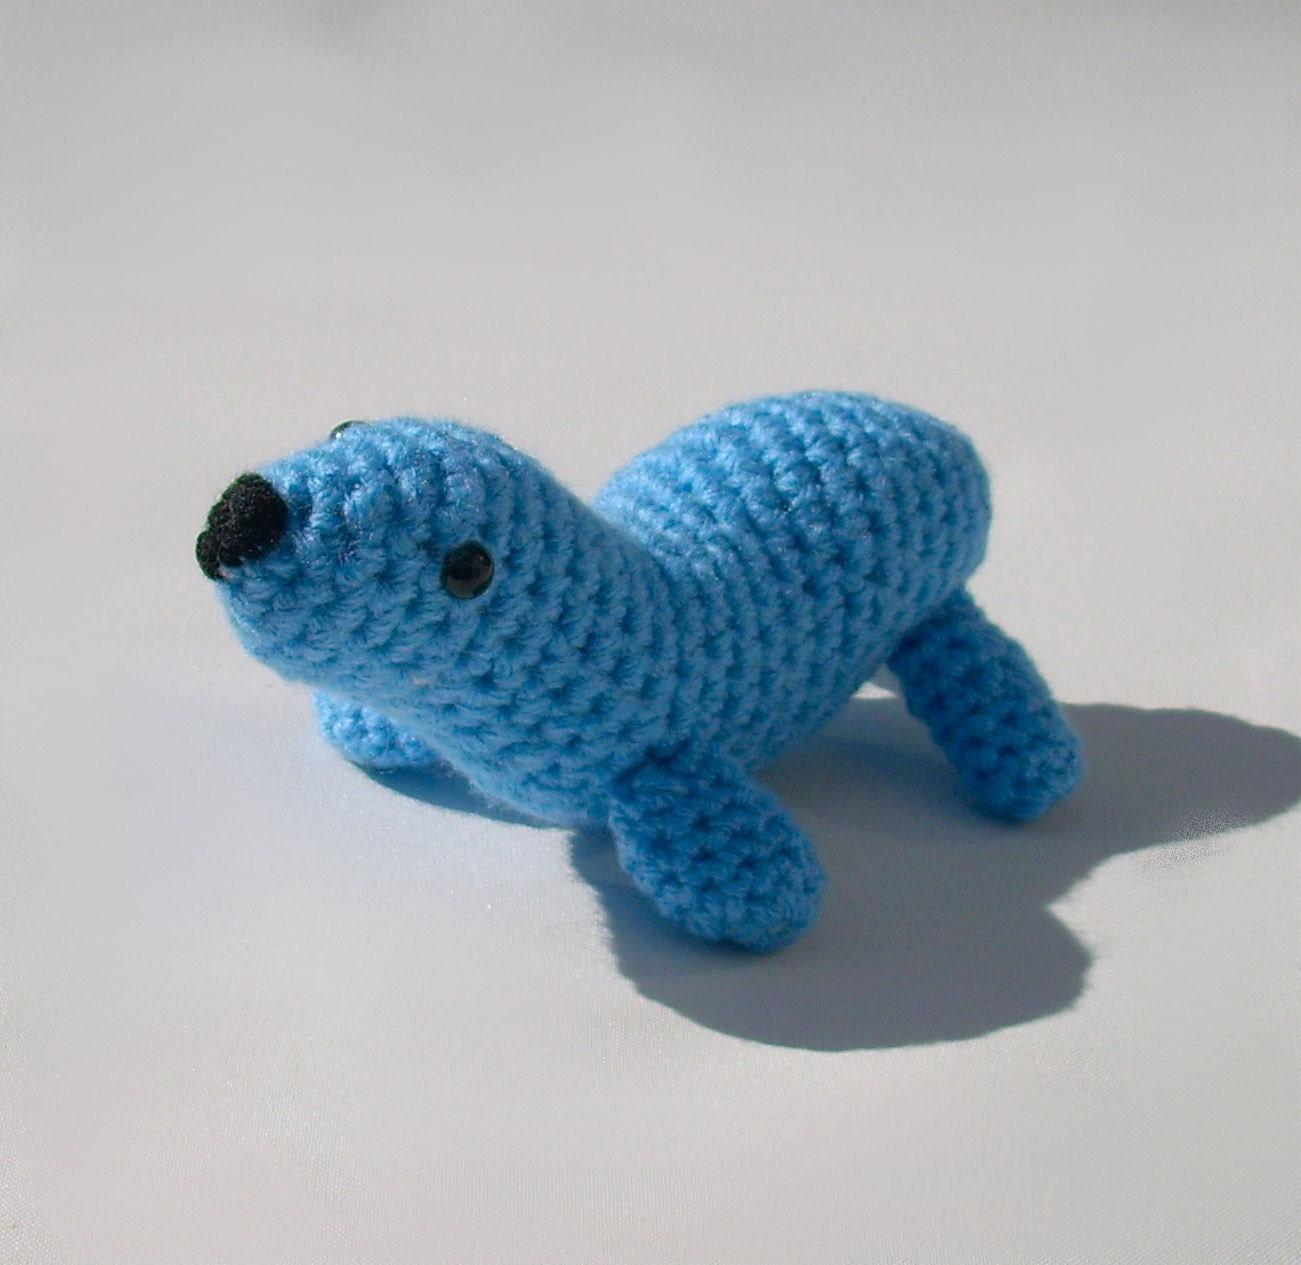 Crochet Amigurumi Seal : Amigurumi crochet seal sea lion animal plush toy critter ...